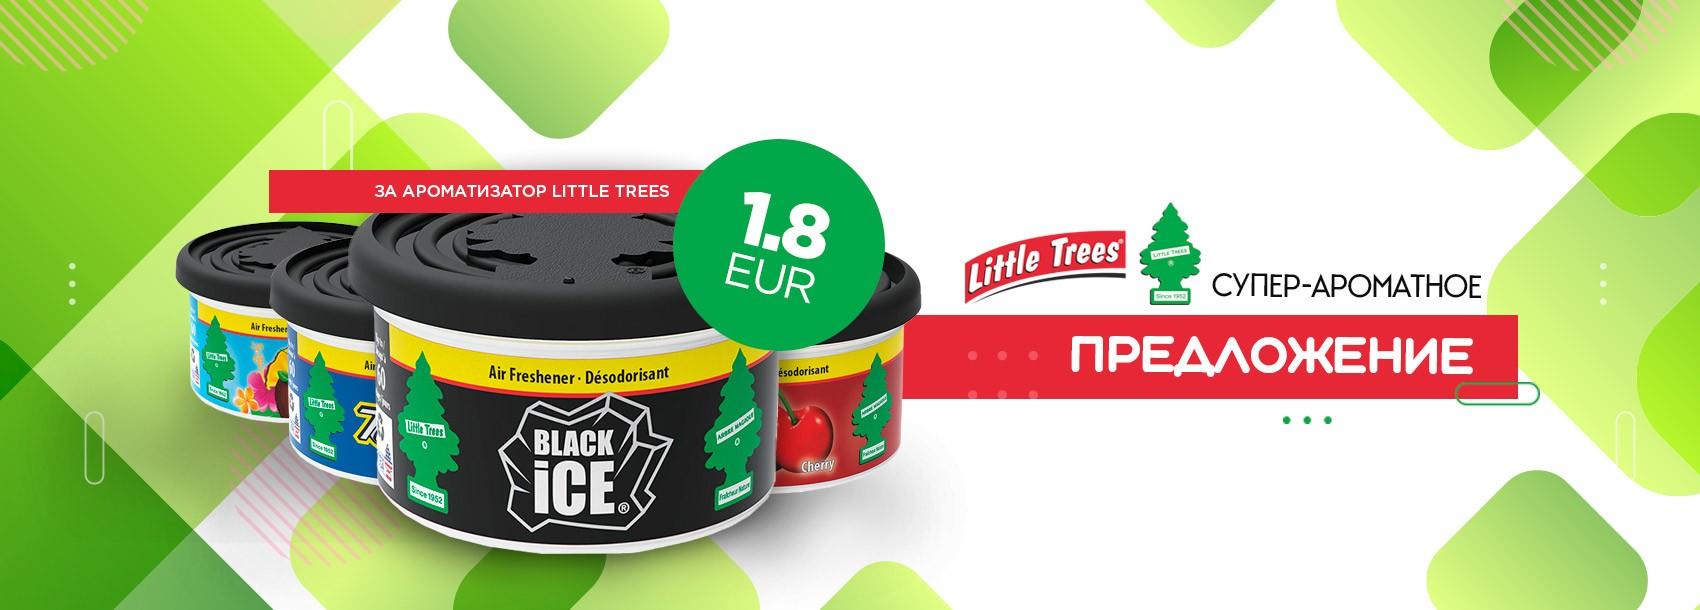 Супер-ароматное предложение Little Trees – ароматизатор 1.8 EUR